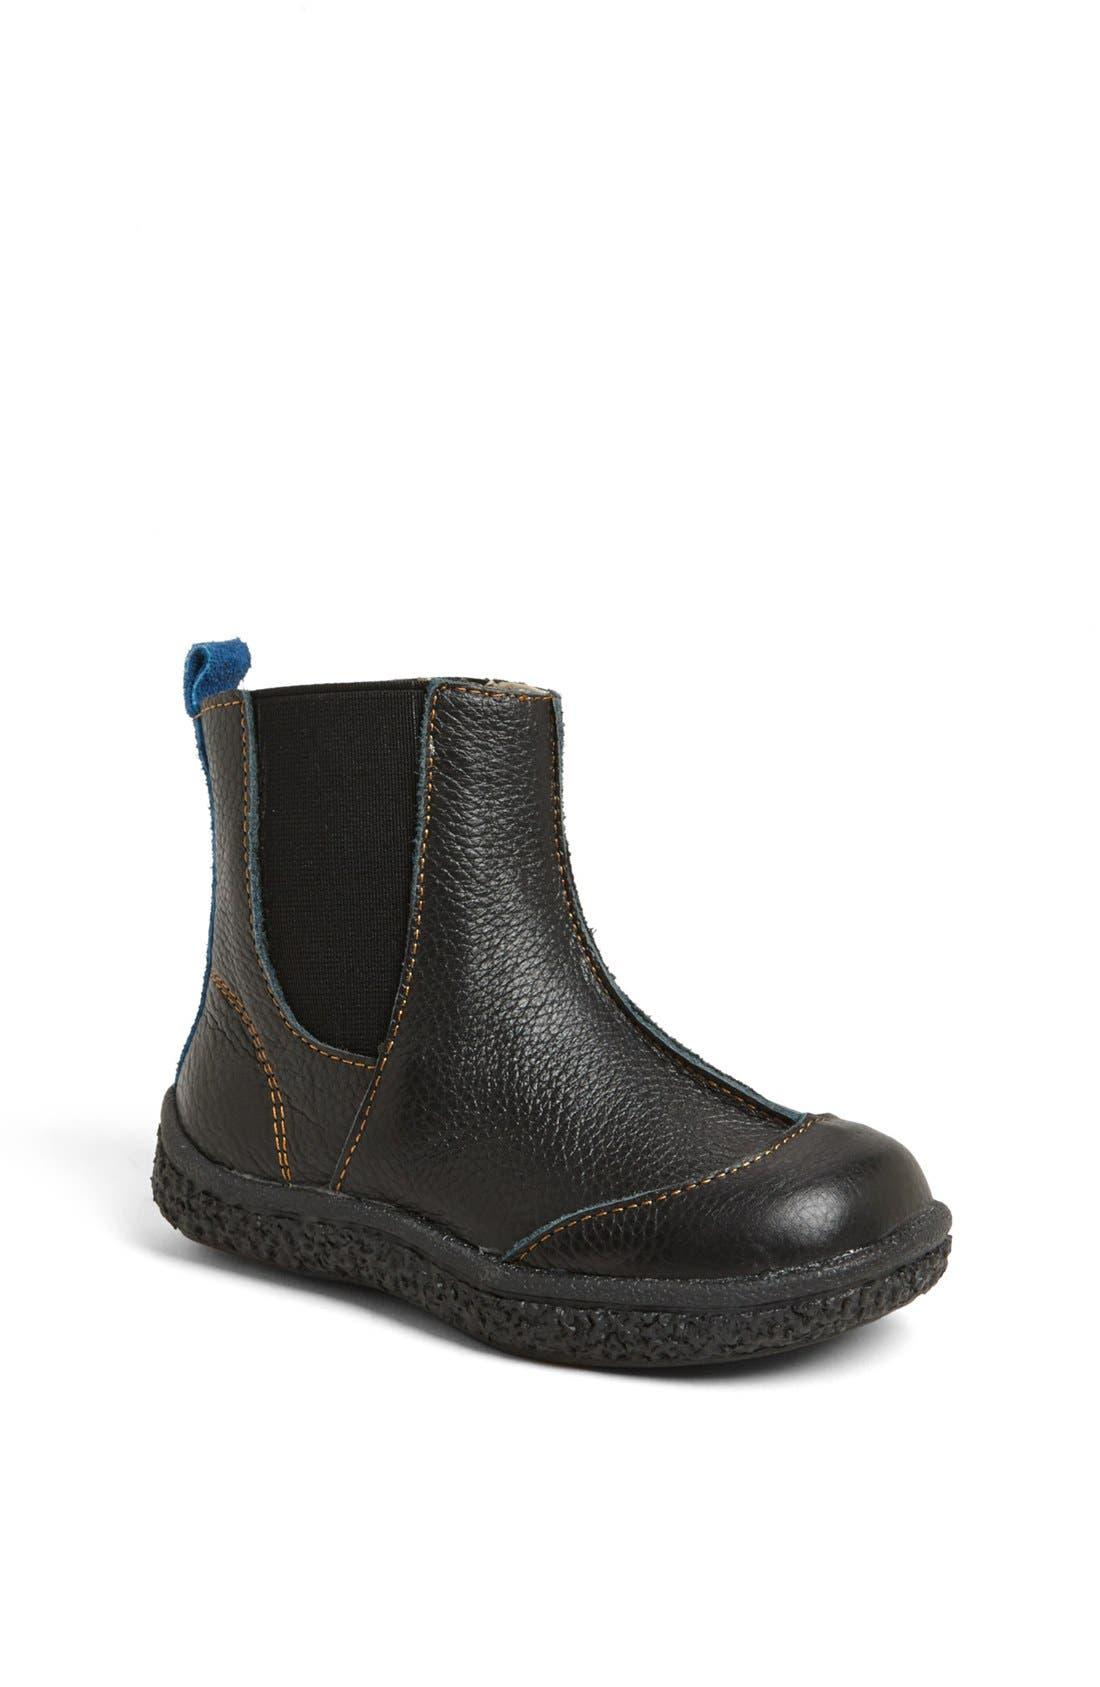 Main Image - See Kai Run 'Mateo' Boot (Toddler & Little Kid)